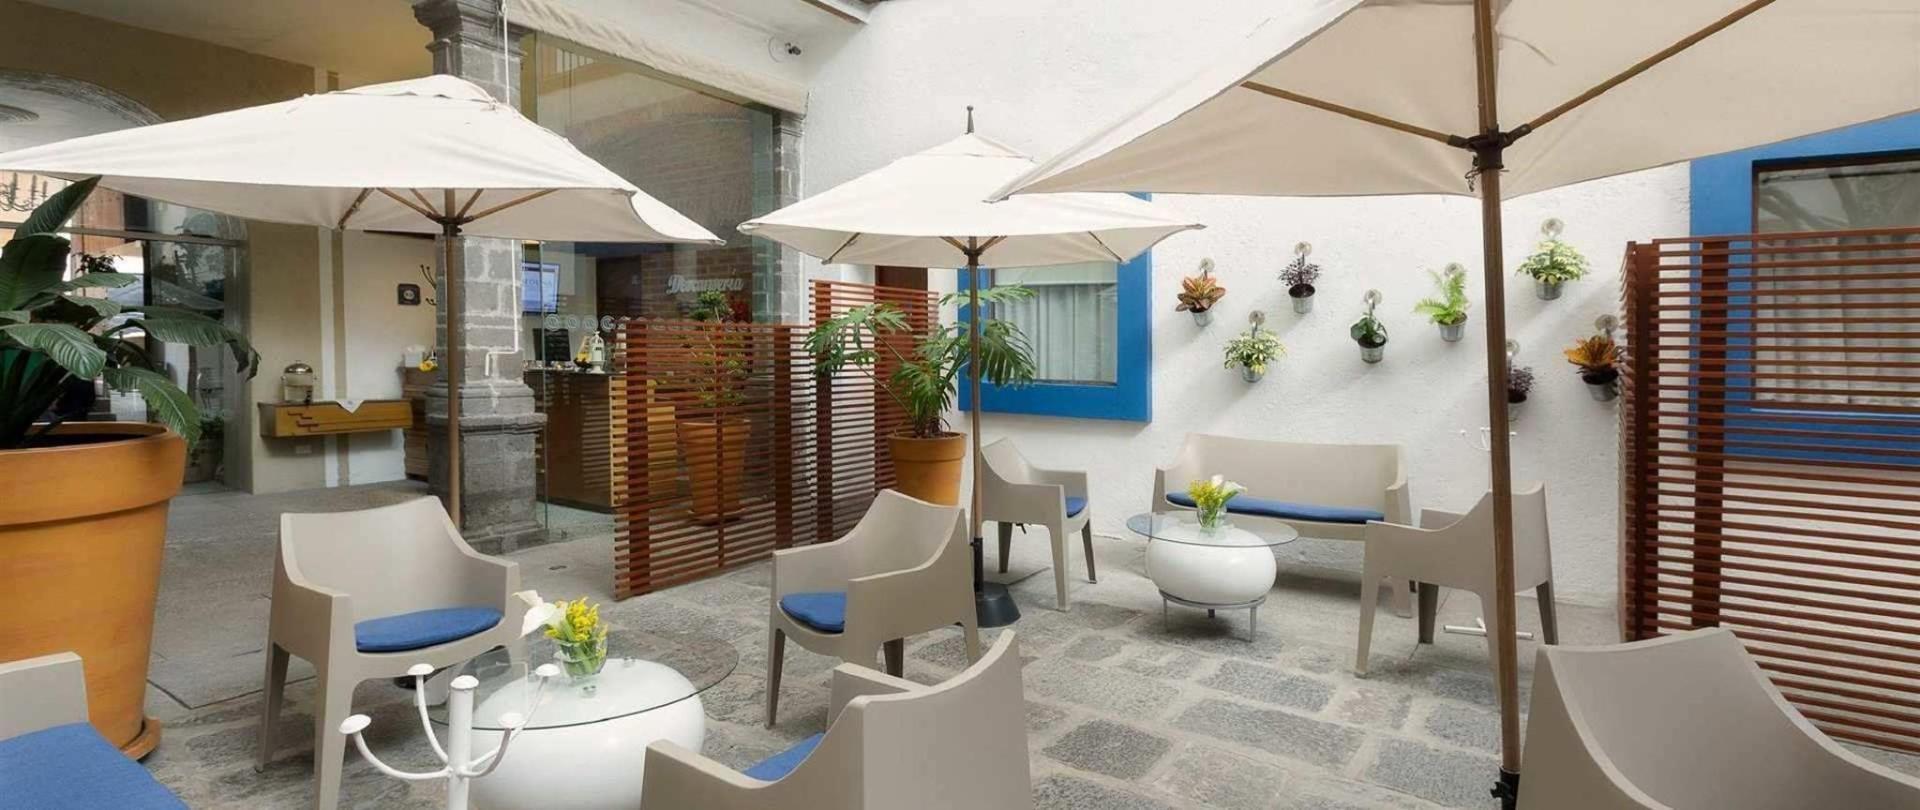 patio-6-jpg.jpeg